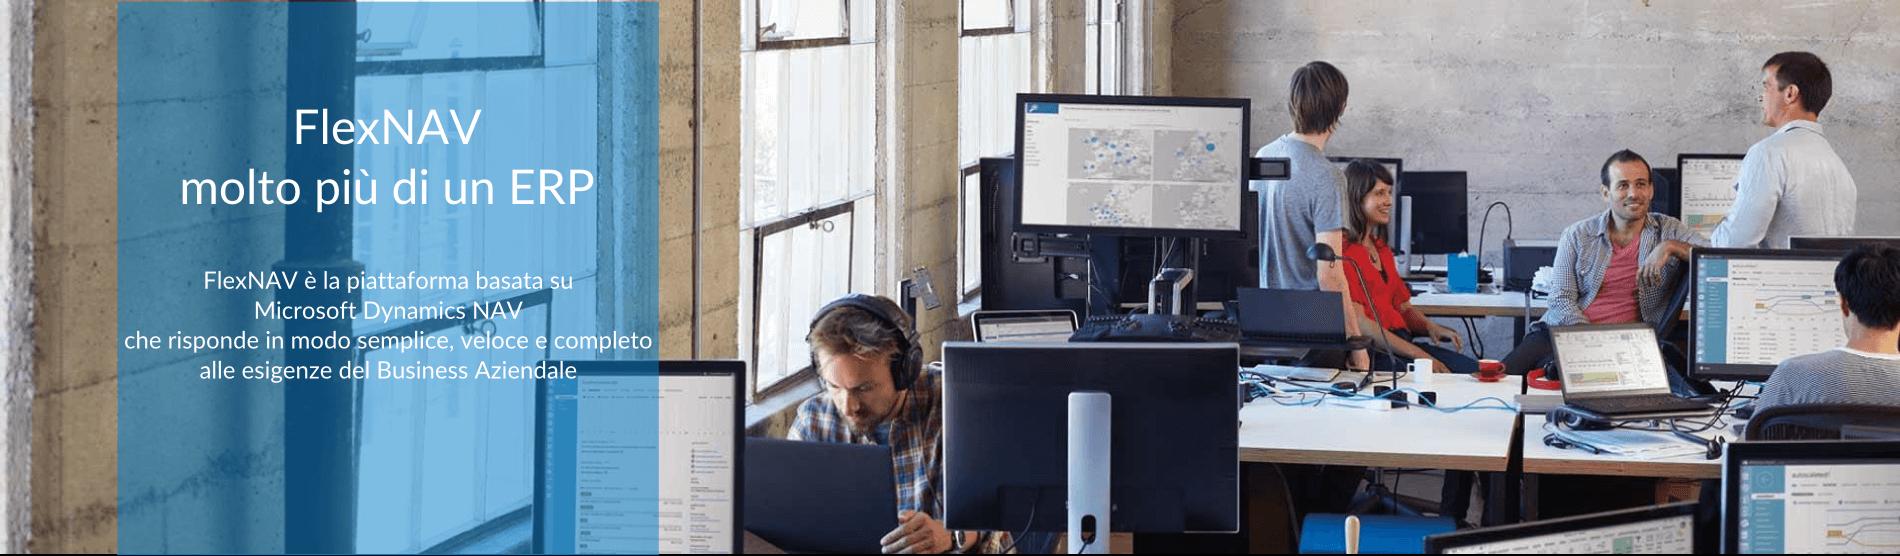 FlexNAV microsoft dynamics nav piattaforma